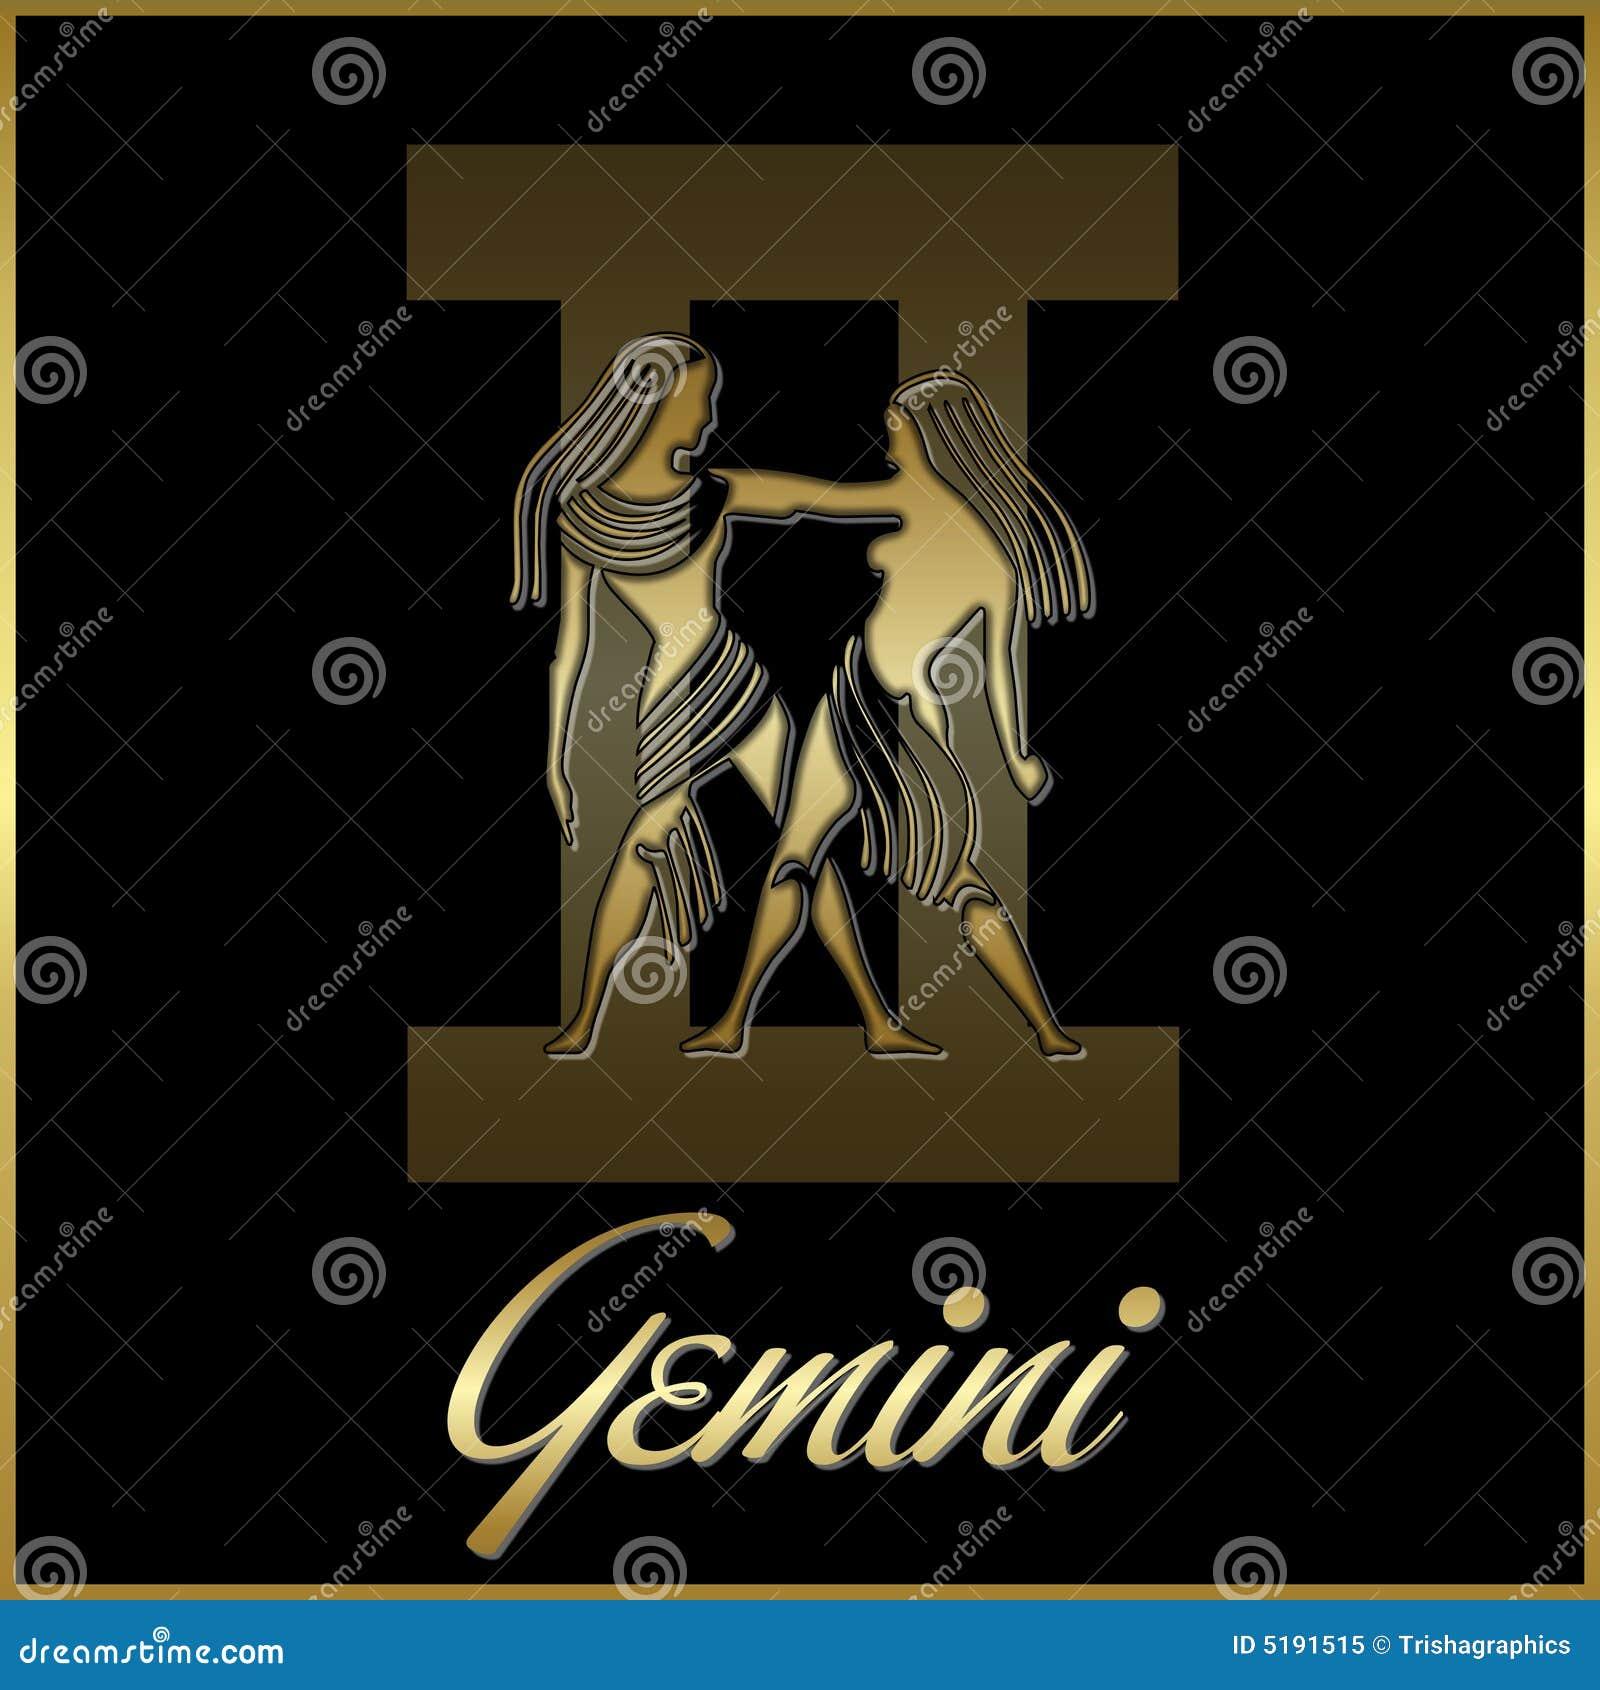 Gemini zodiac star sign stock illustration illustration of gemini zodiac star sign buycottarizona